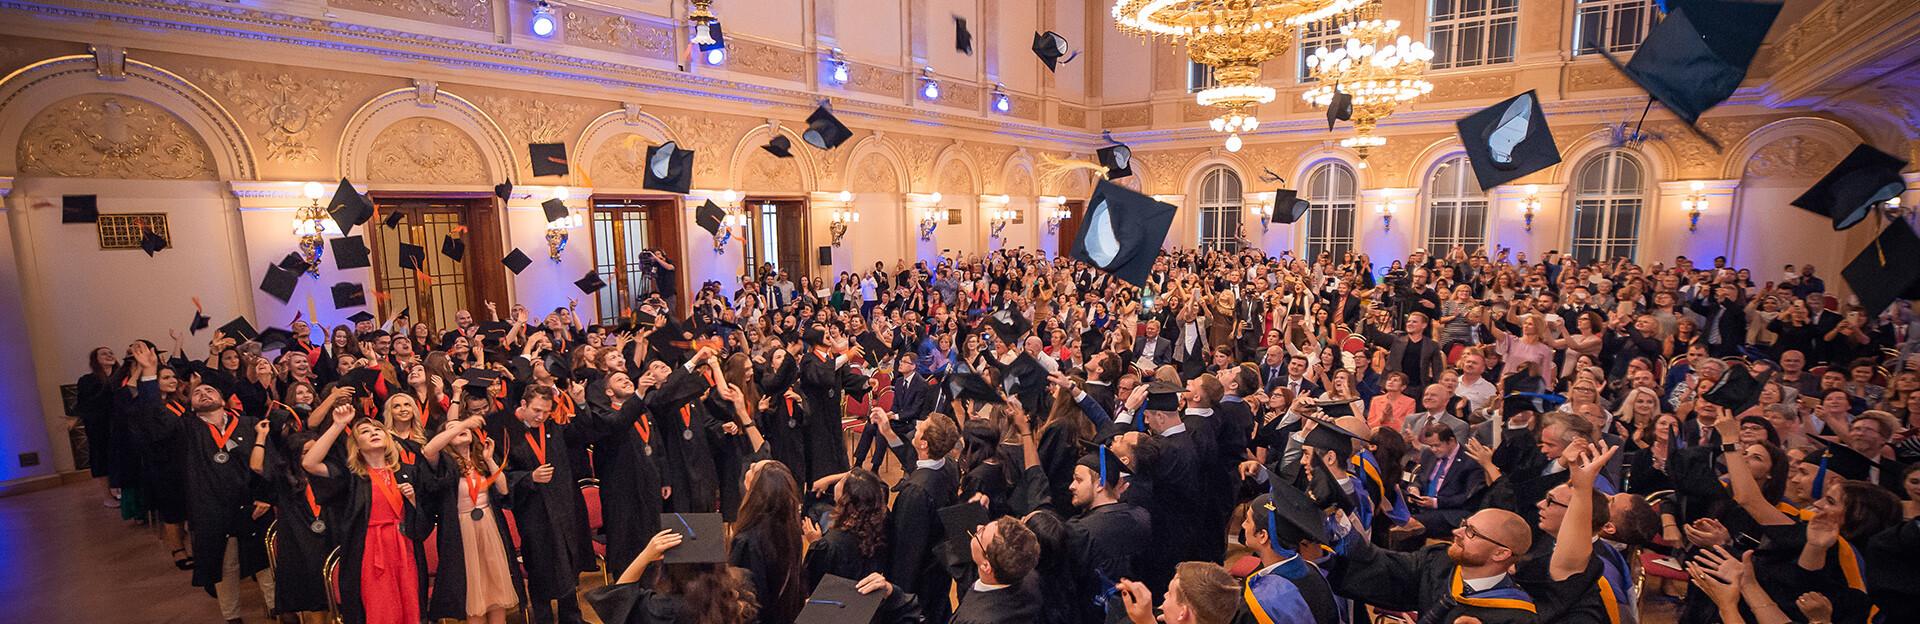 University of New York in Prague (UNYP)